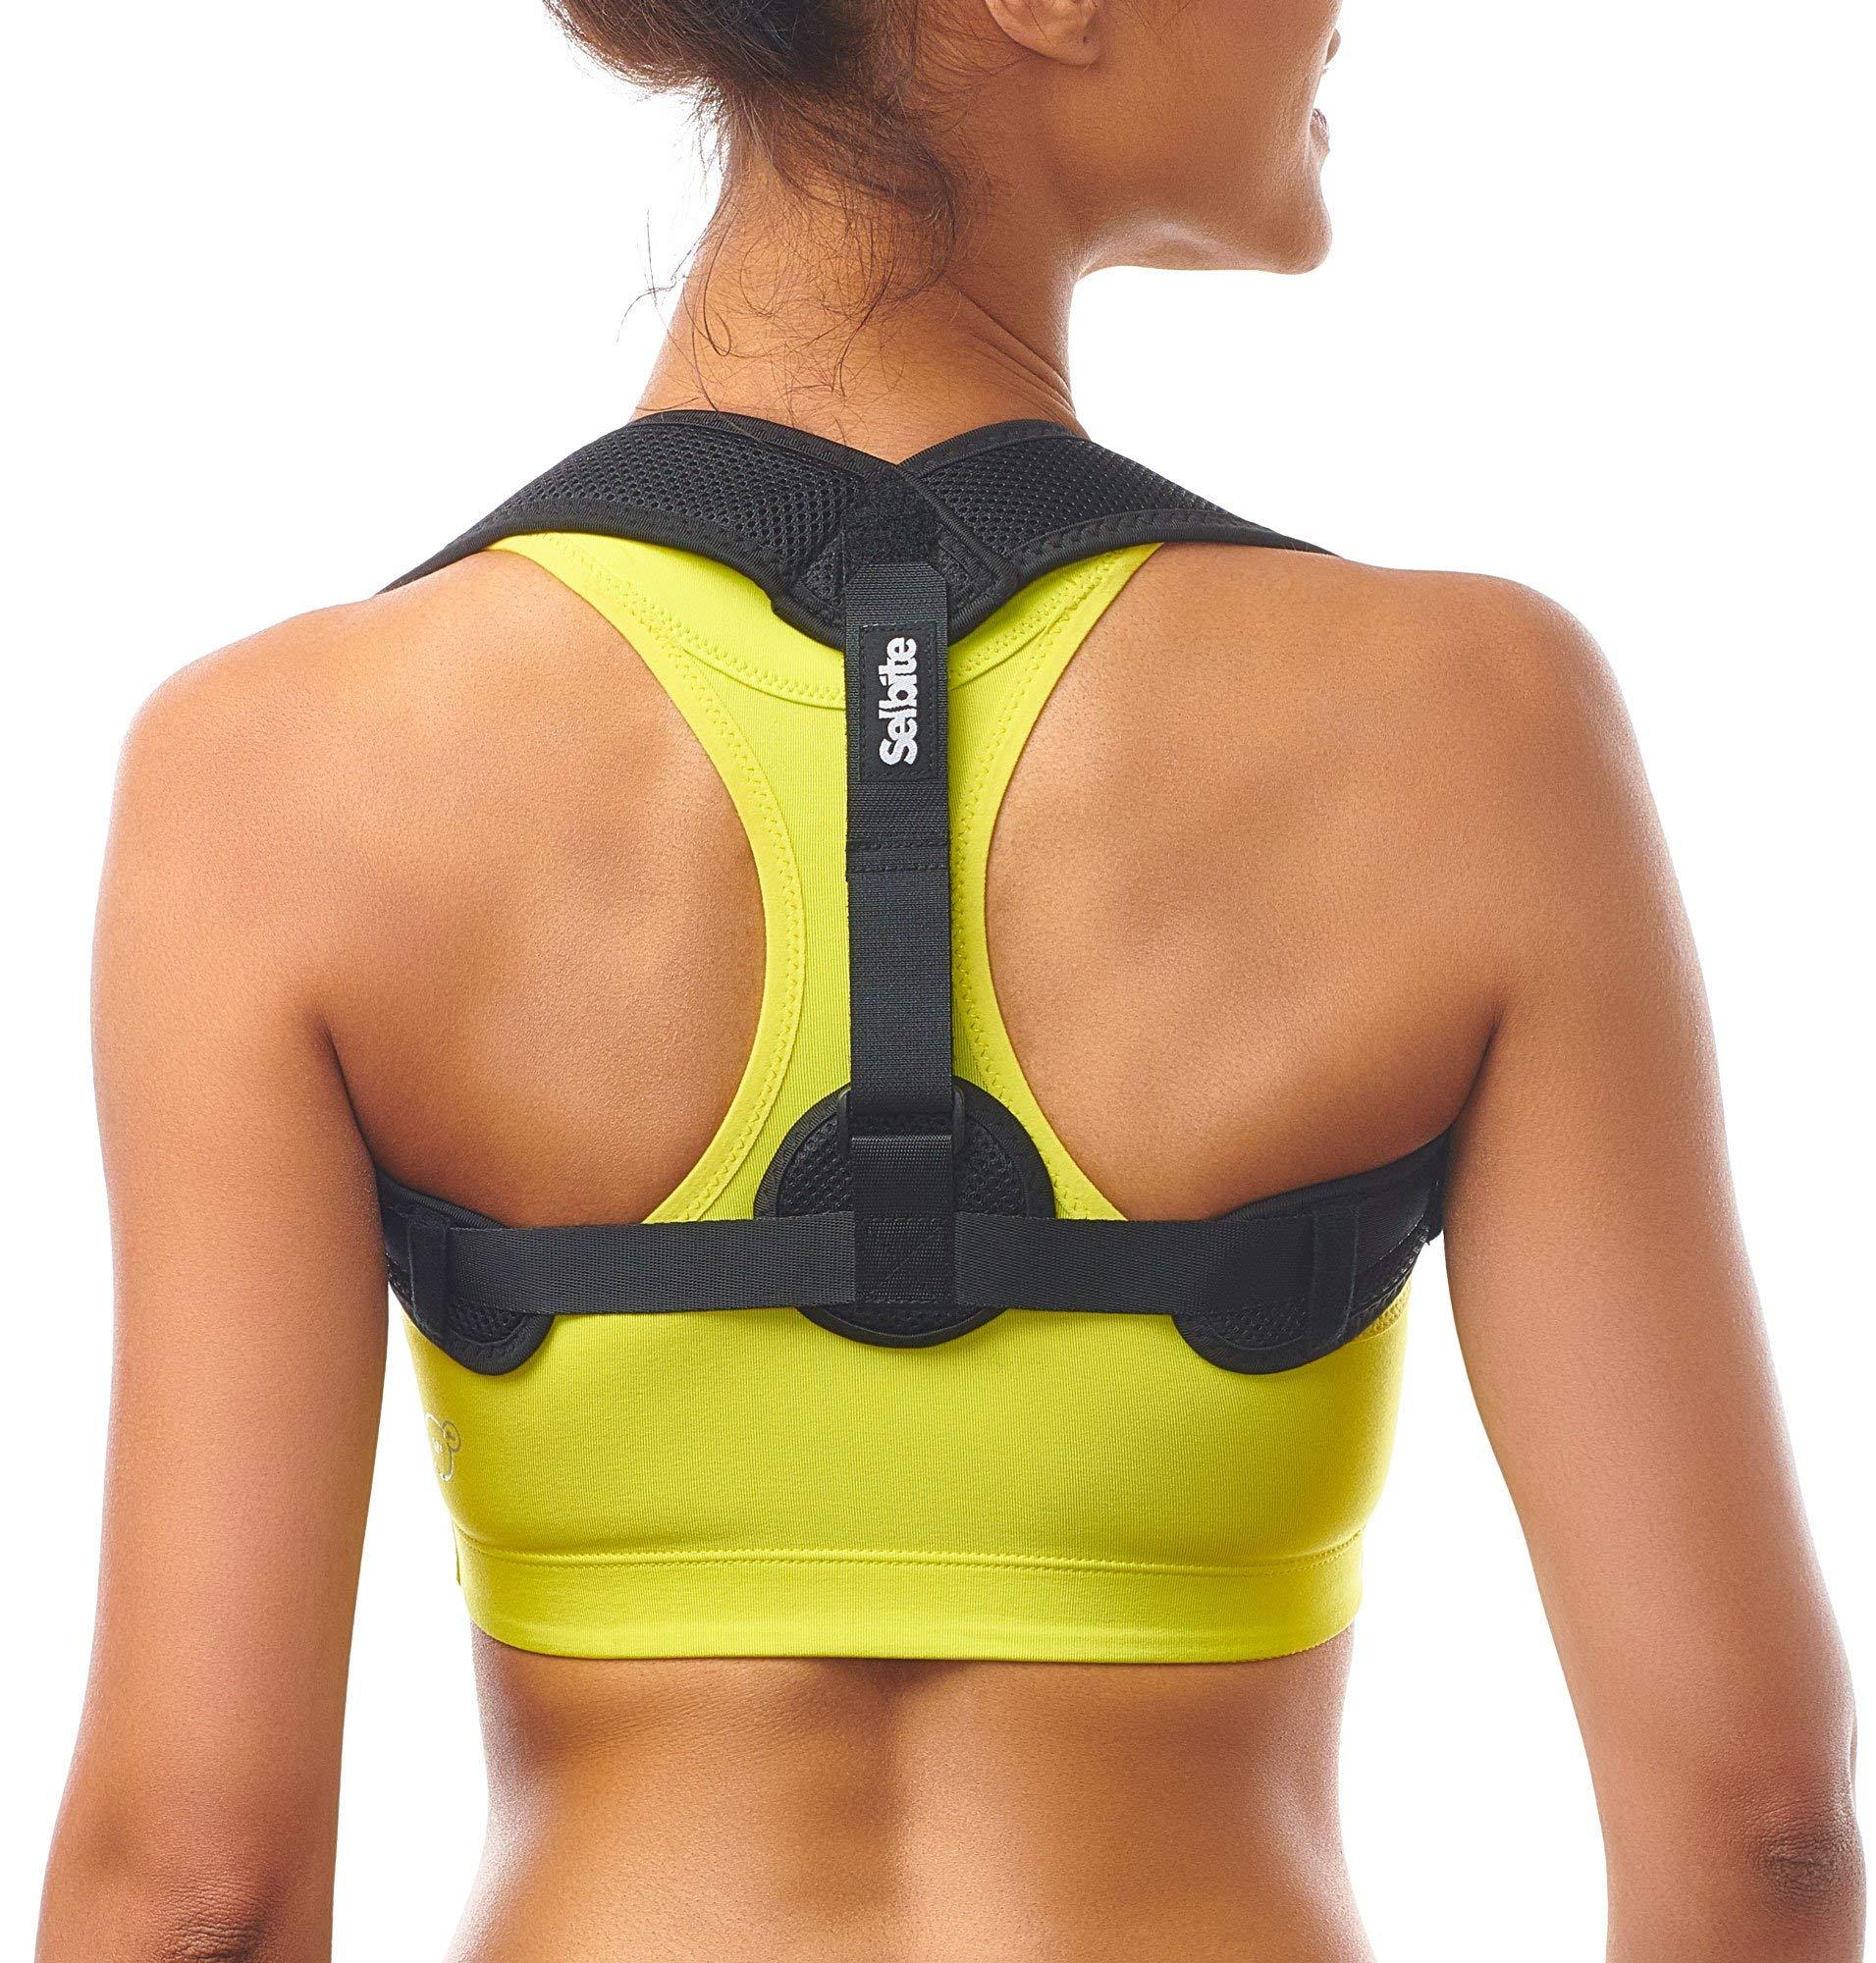 Posture Corrector for Women Men Adjustable